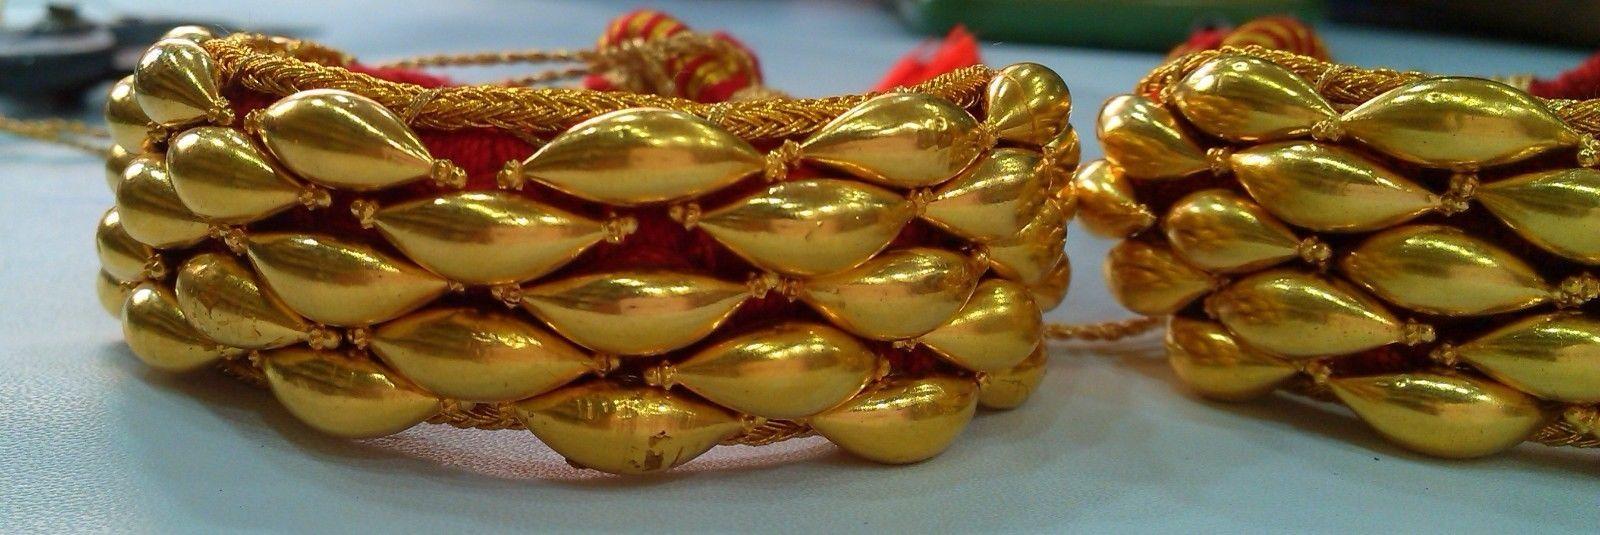 VINTAGE TRADITIONAL HANDMADE 22K GOLD JEWELRY BEADS BRACELET BANGLE PAIR PUNCHI